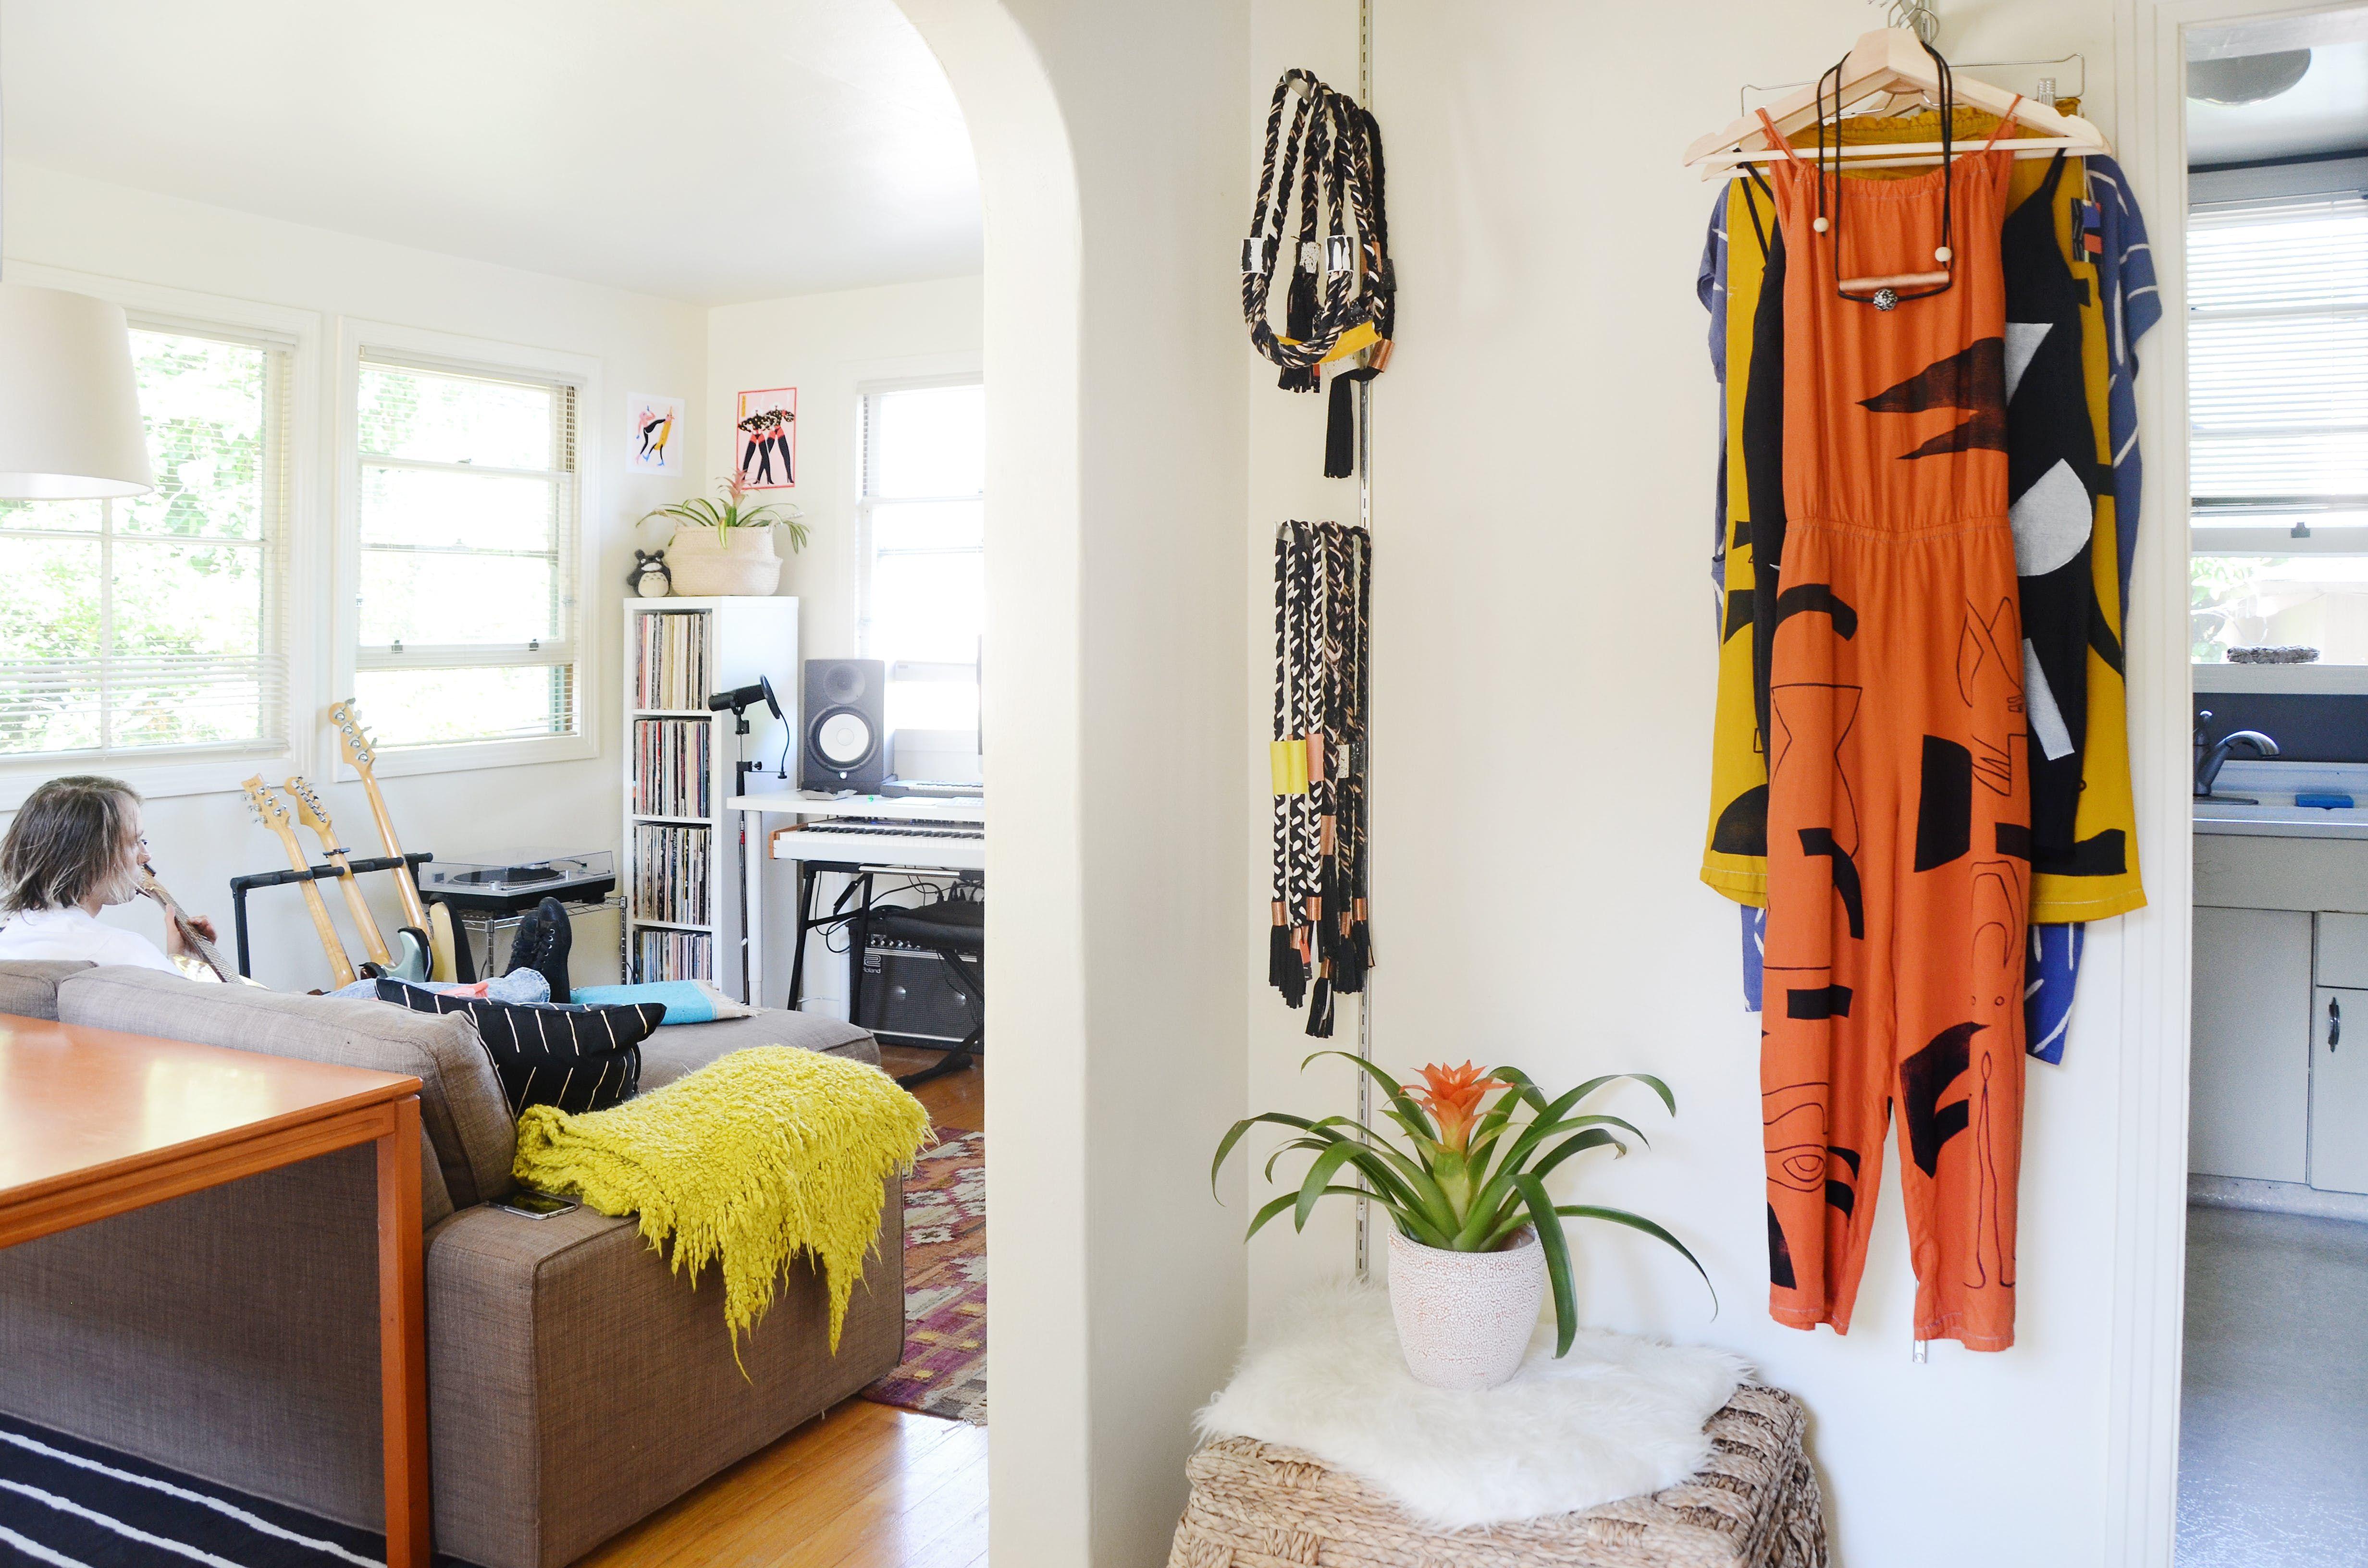 Tour a Home with Creative Energy and Tree House Charm | Studio setup ...